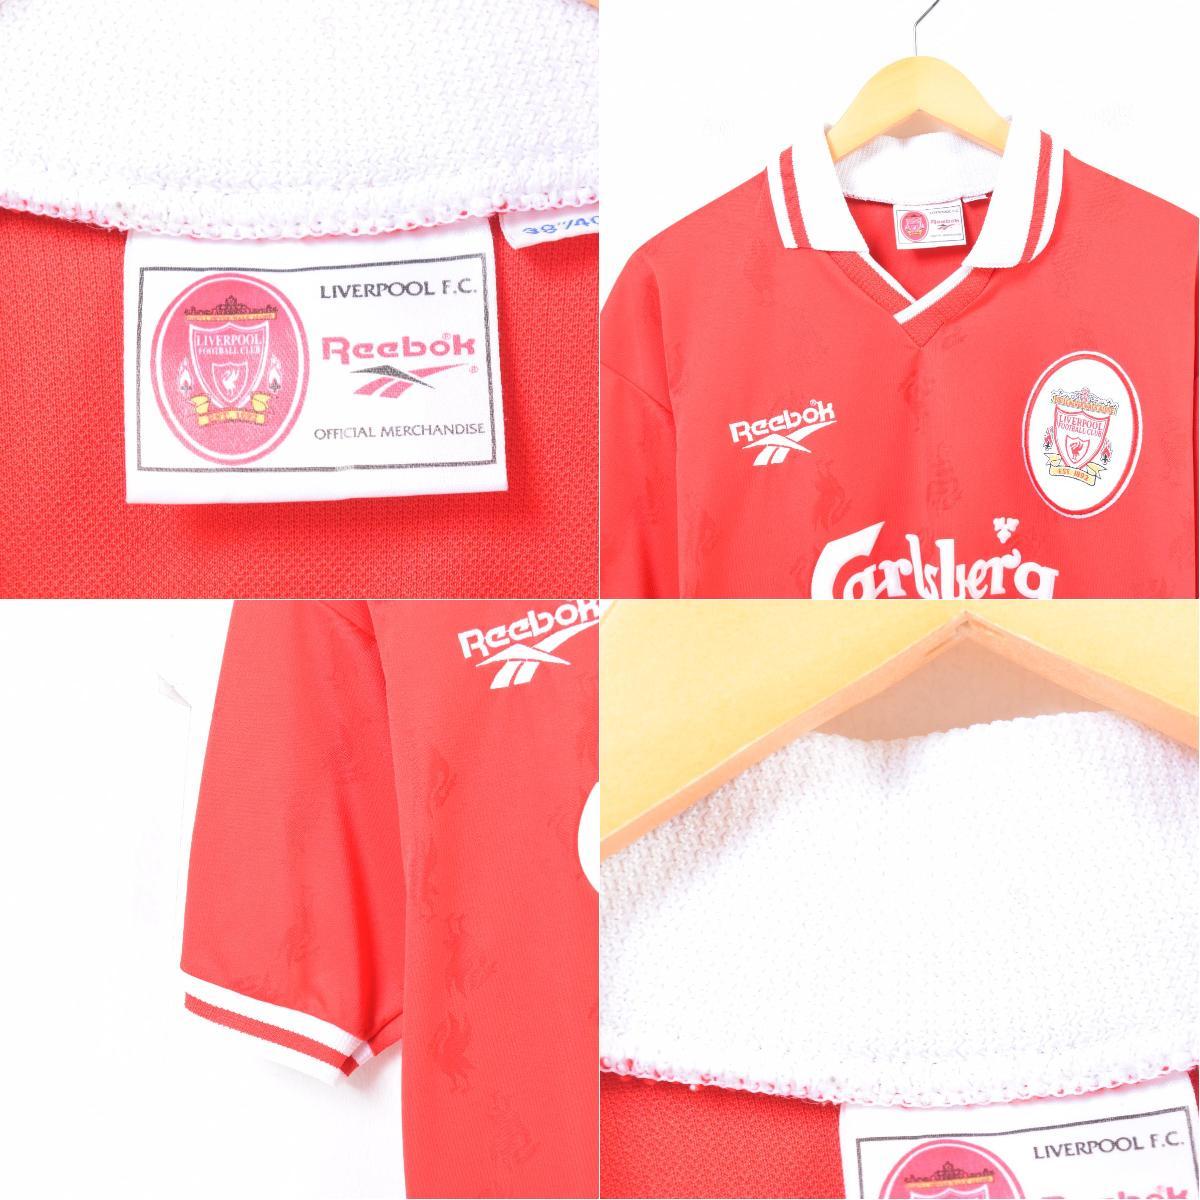 99ccee3f040 Buy Soccer Shirts Uk - DREAMWORKS